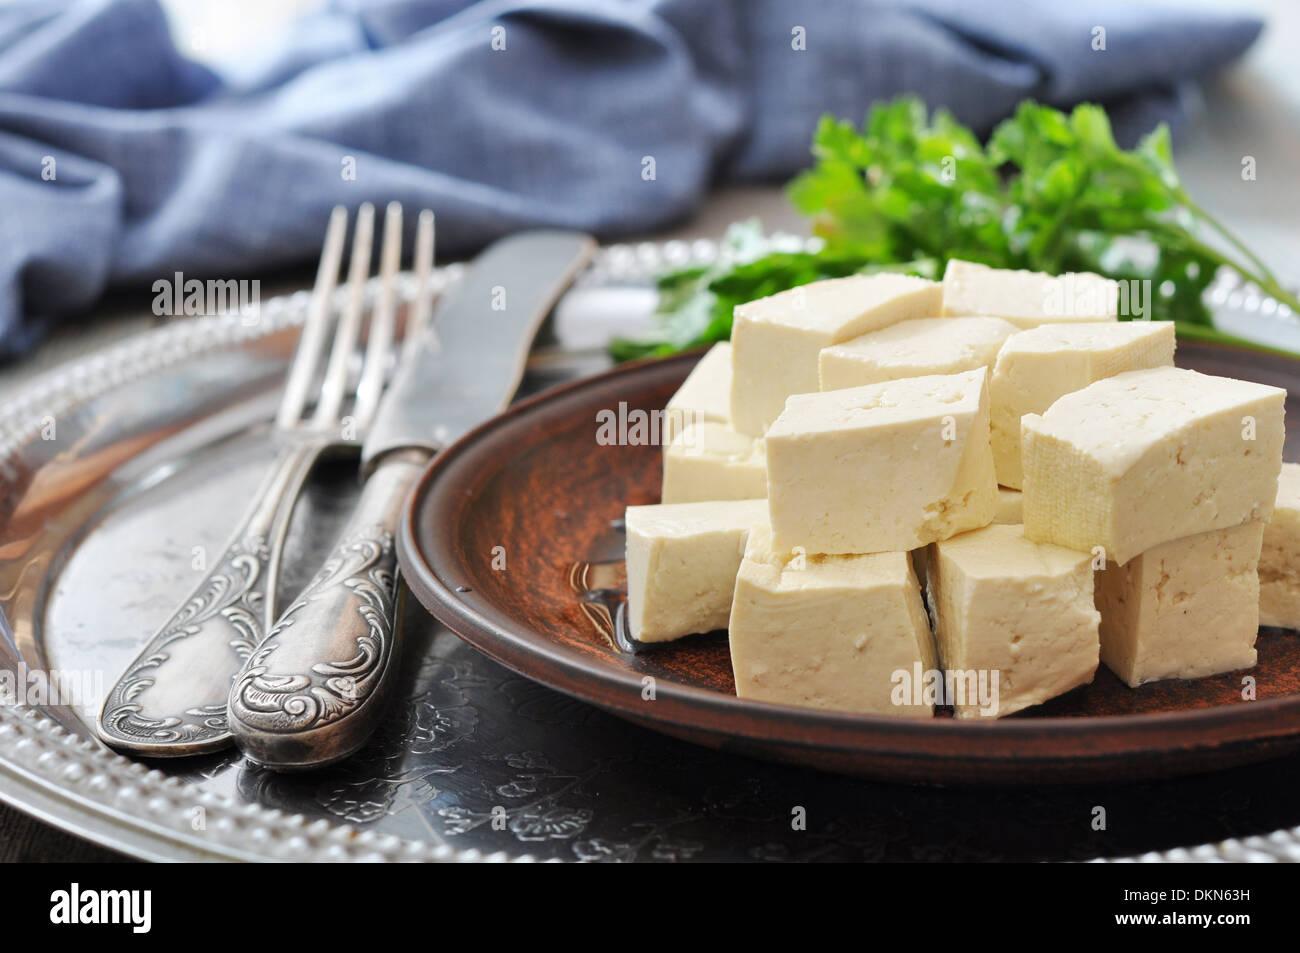 Tofu on plate with fresh tomatos on metal tray - Stock Image